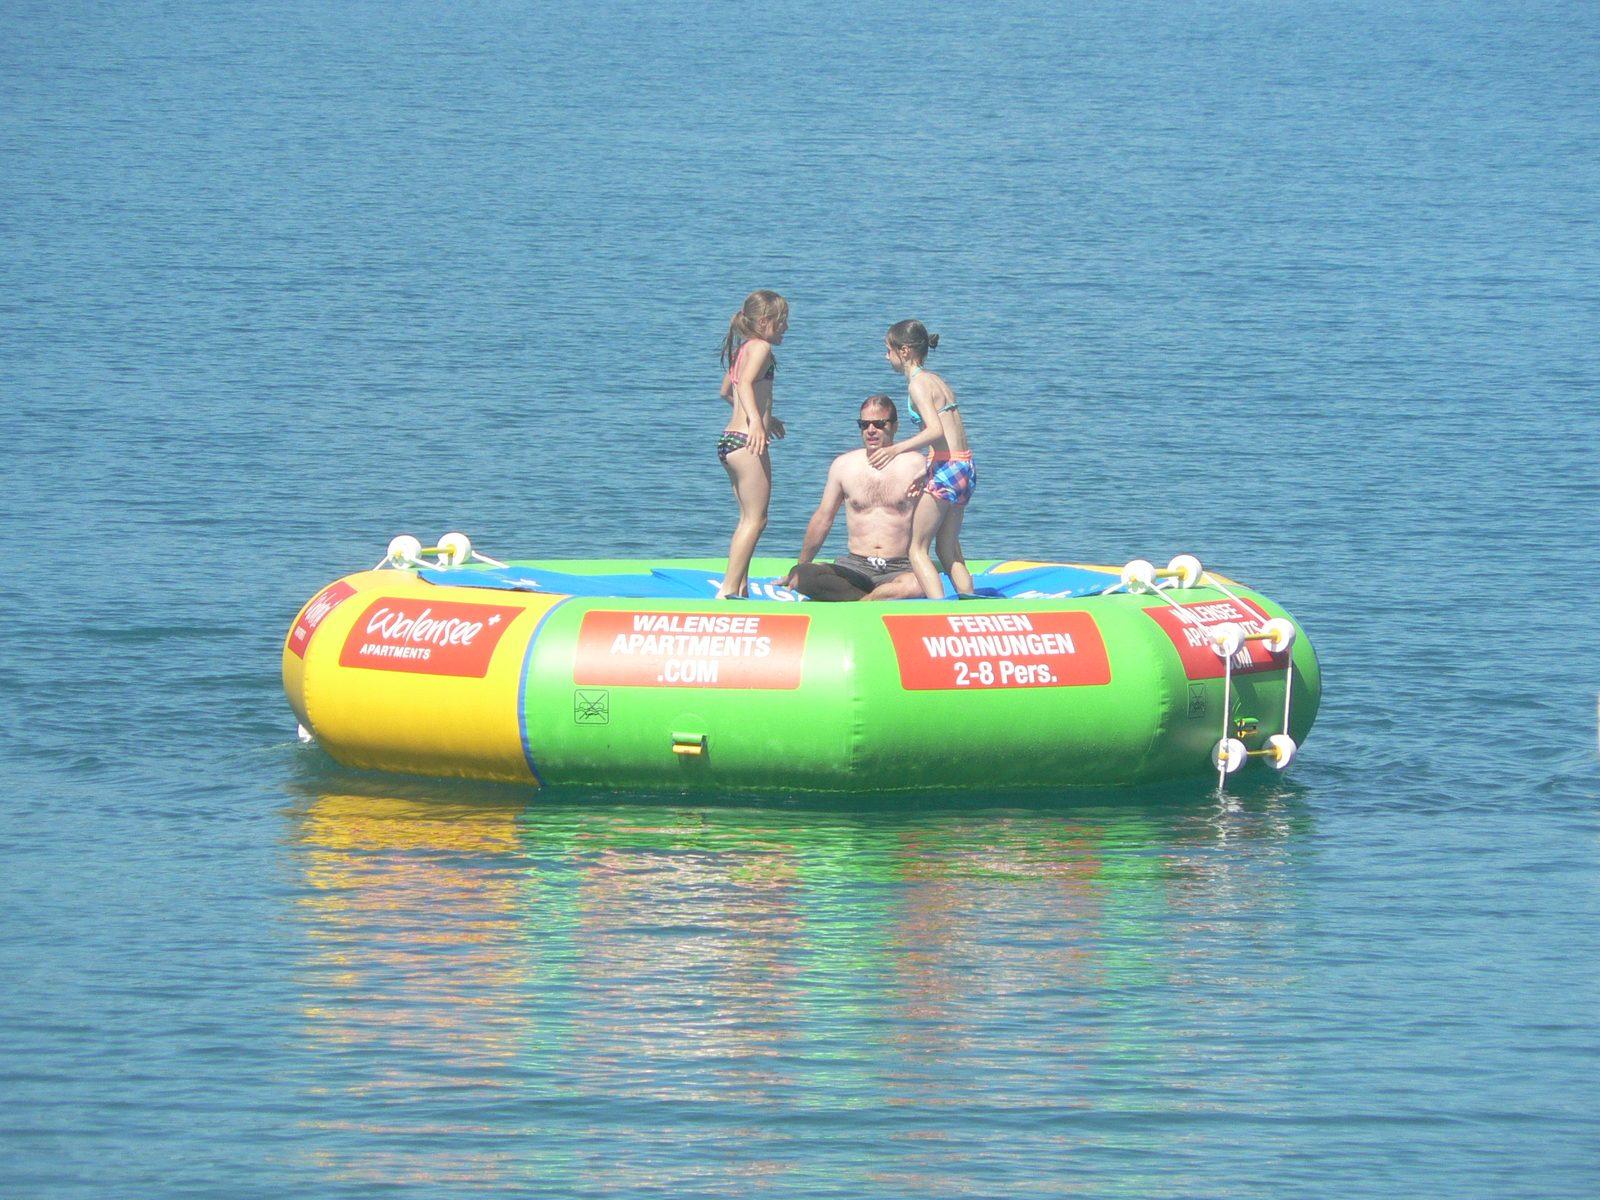 Ons trampoline eiland